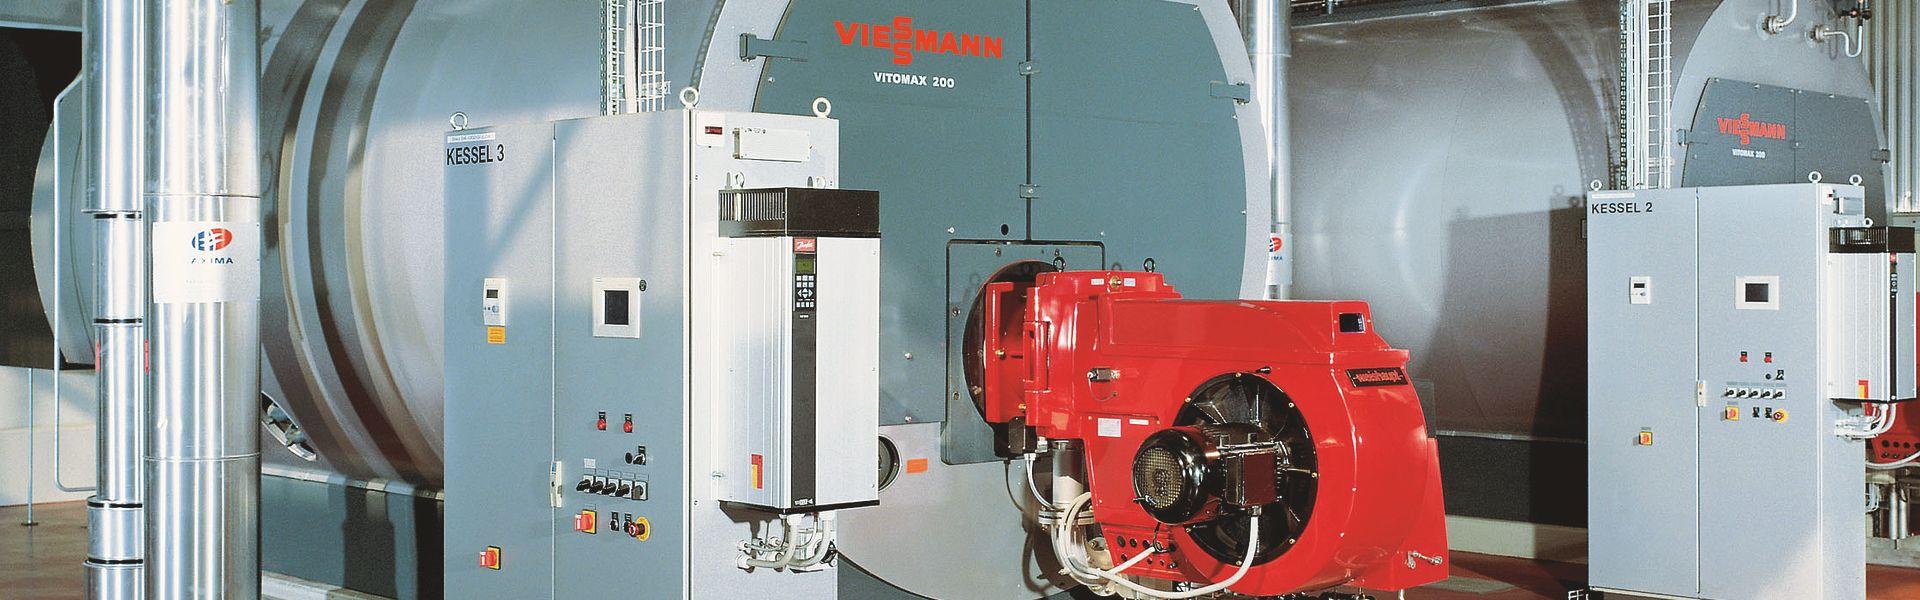 Generatore_-vapore_industriale-compressor